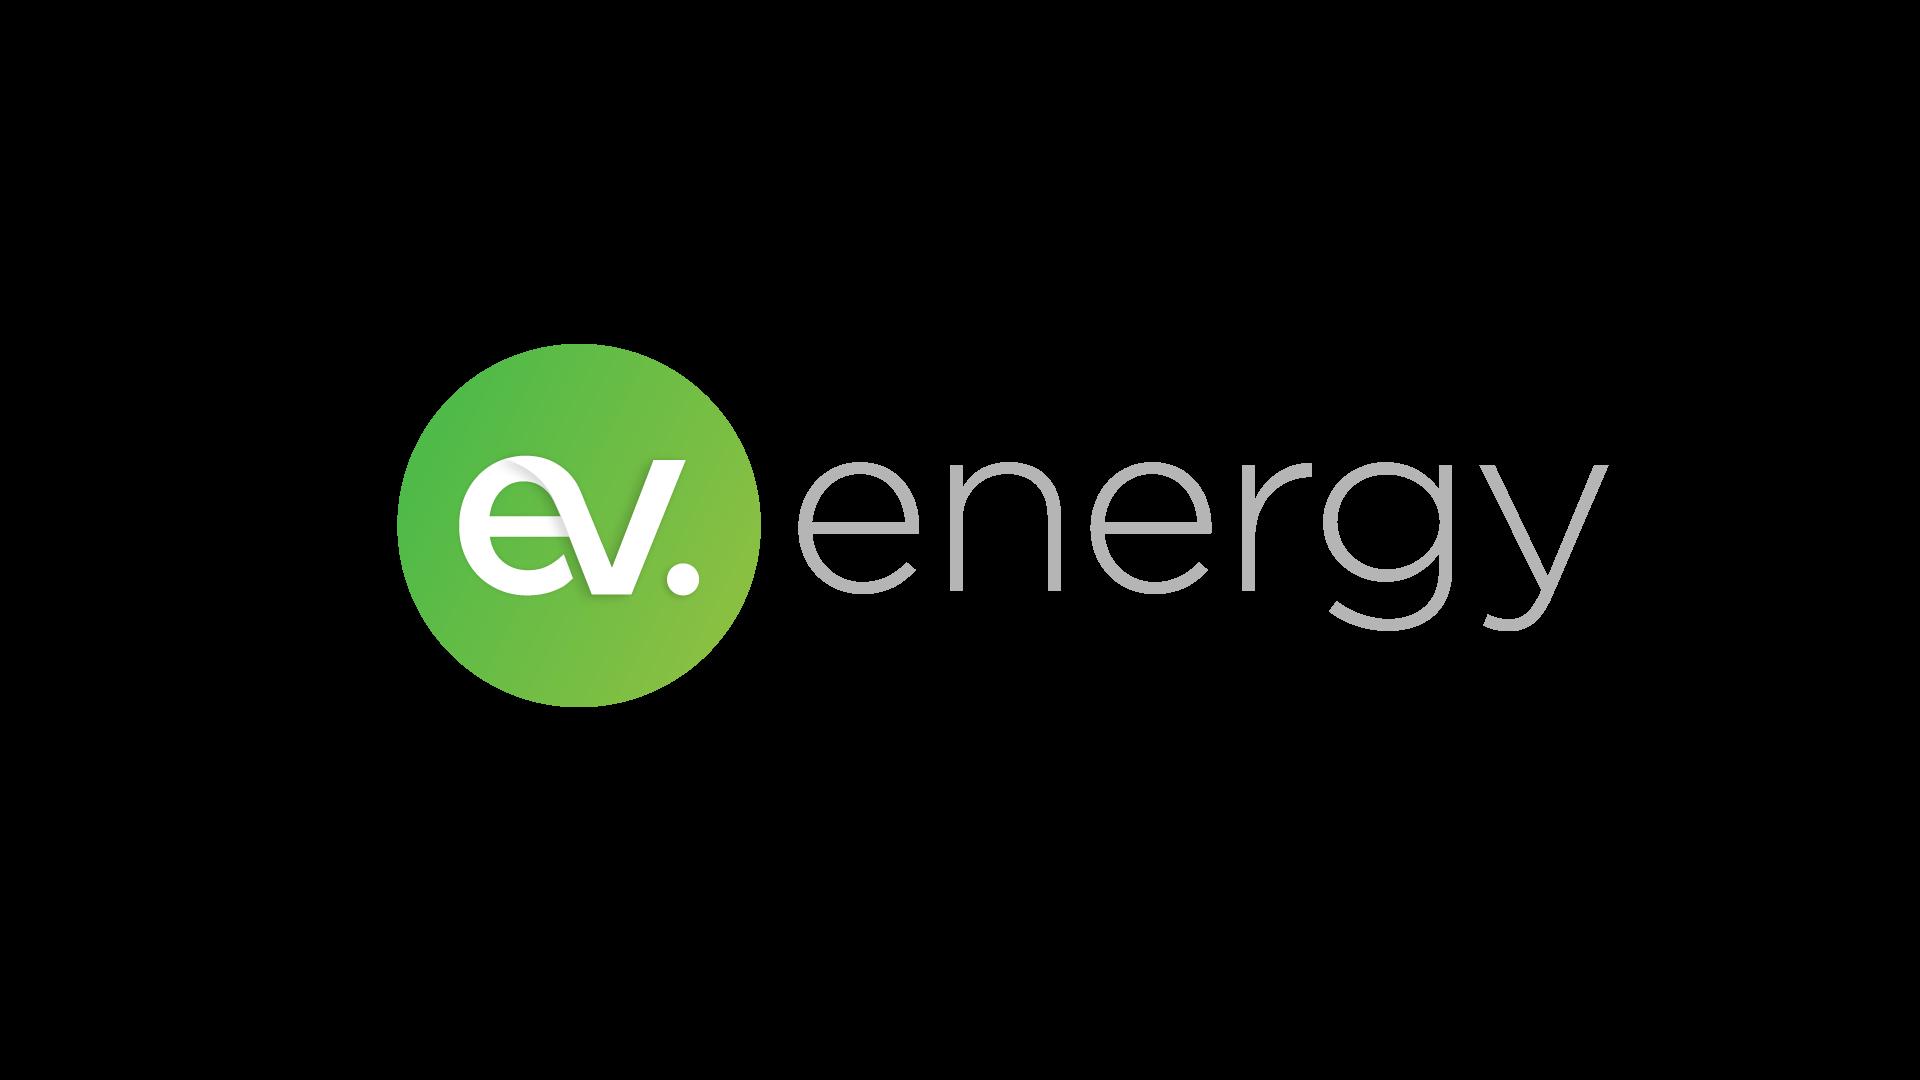 ev.energy Company Logo